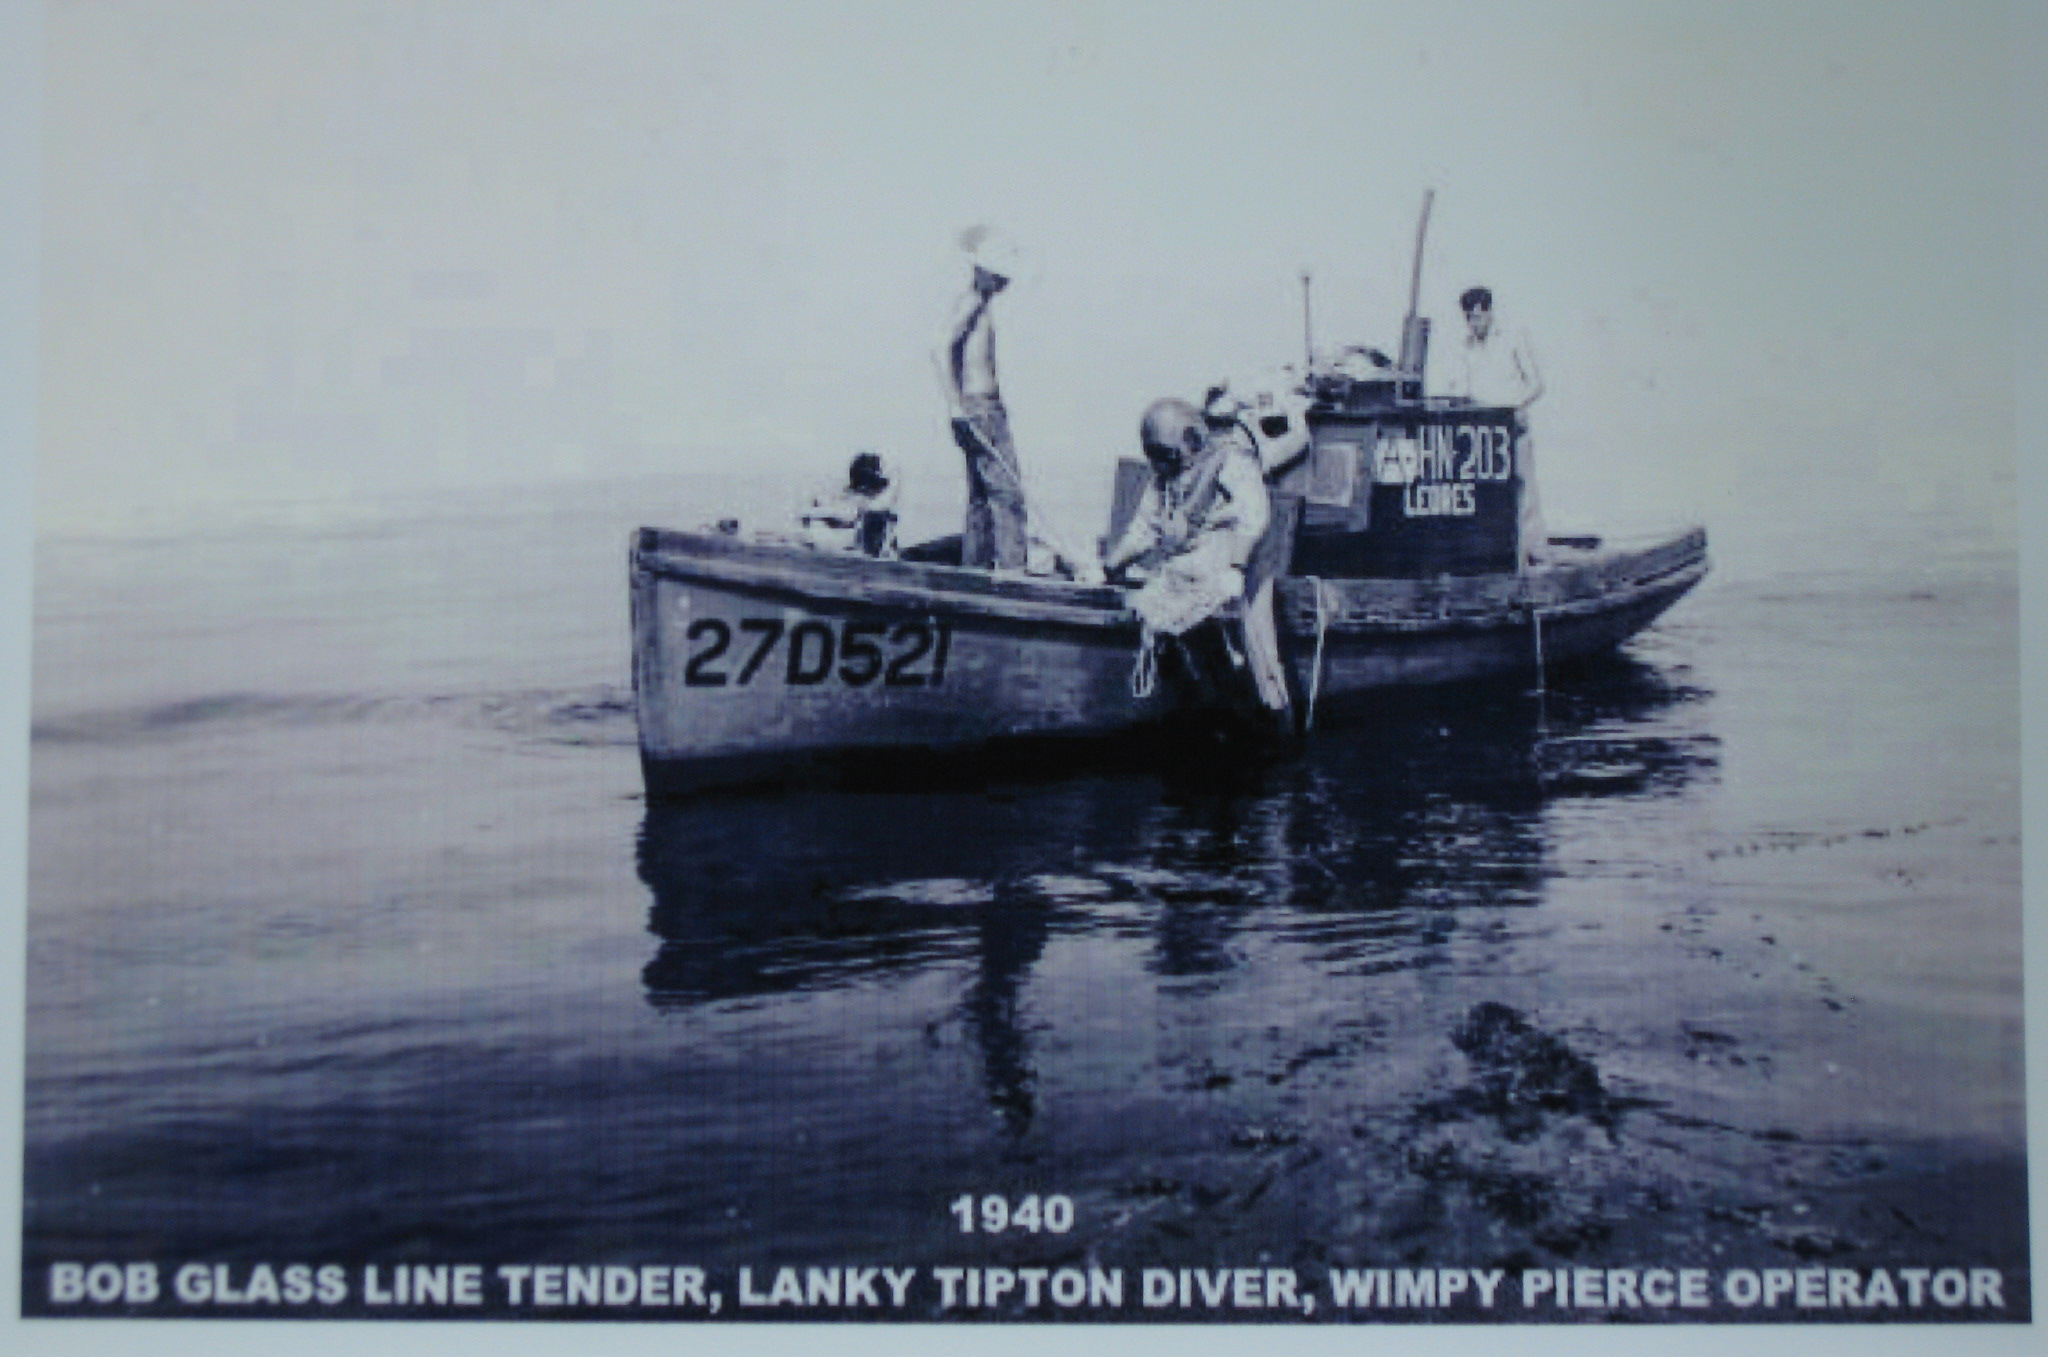 Wimpy Pierce Boat 1940 (courtesy Steve Rebuck)